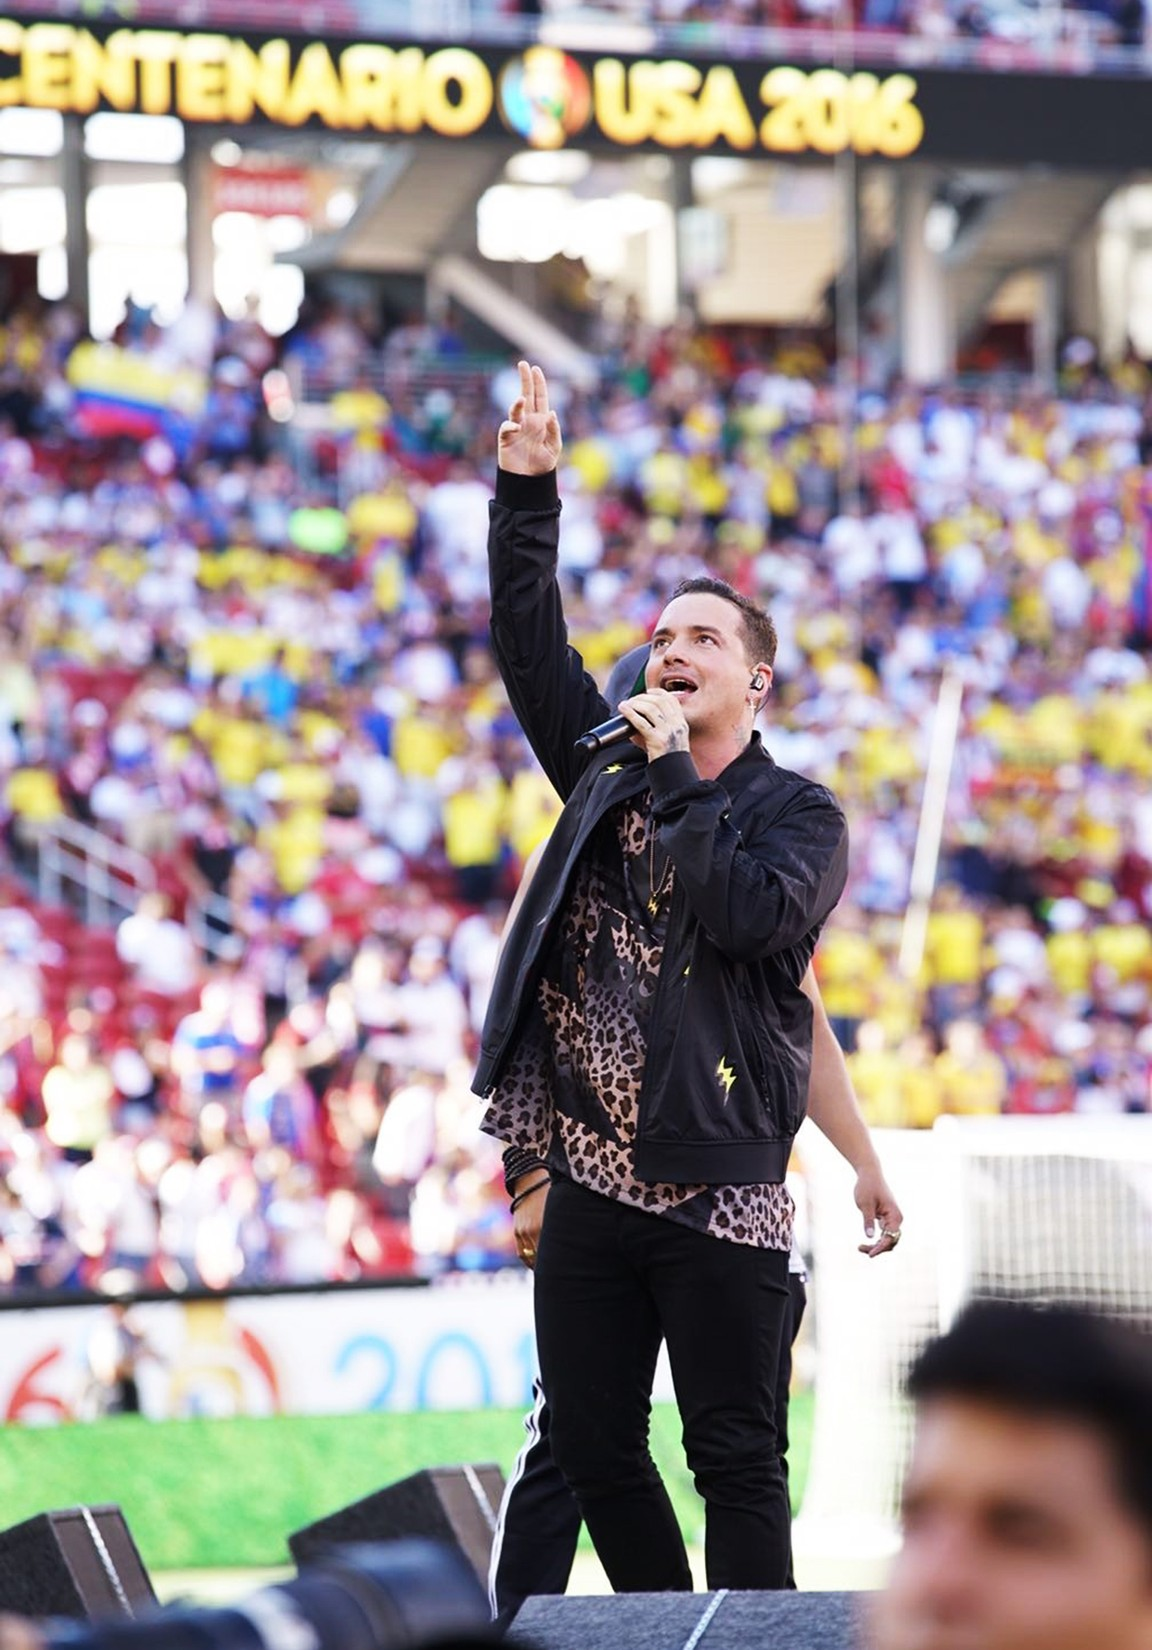 J Balvin performs at the Copa America Centenario opening ceremony in Santa Clara, Calif. on June 3, 2016.